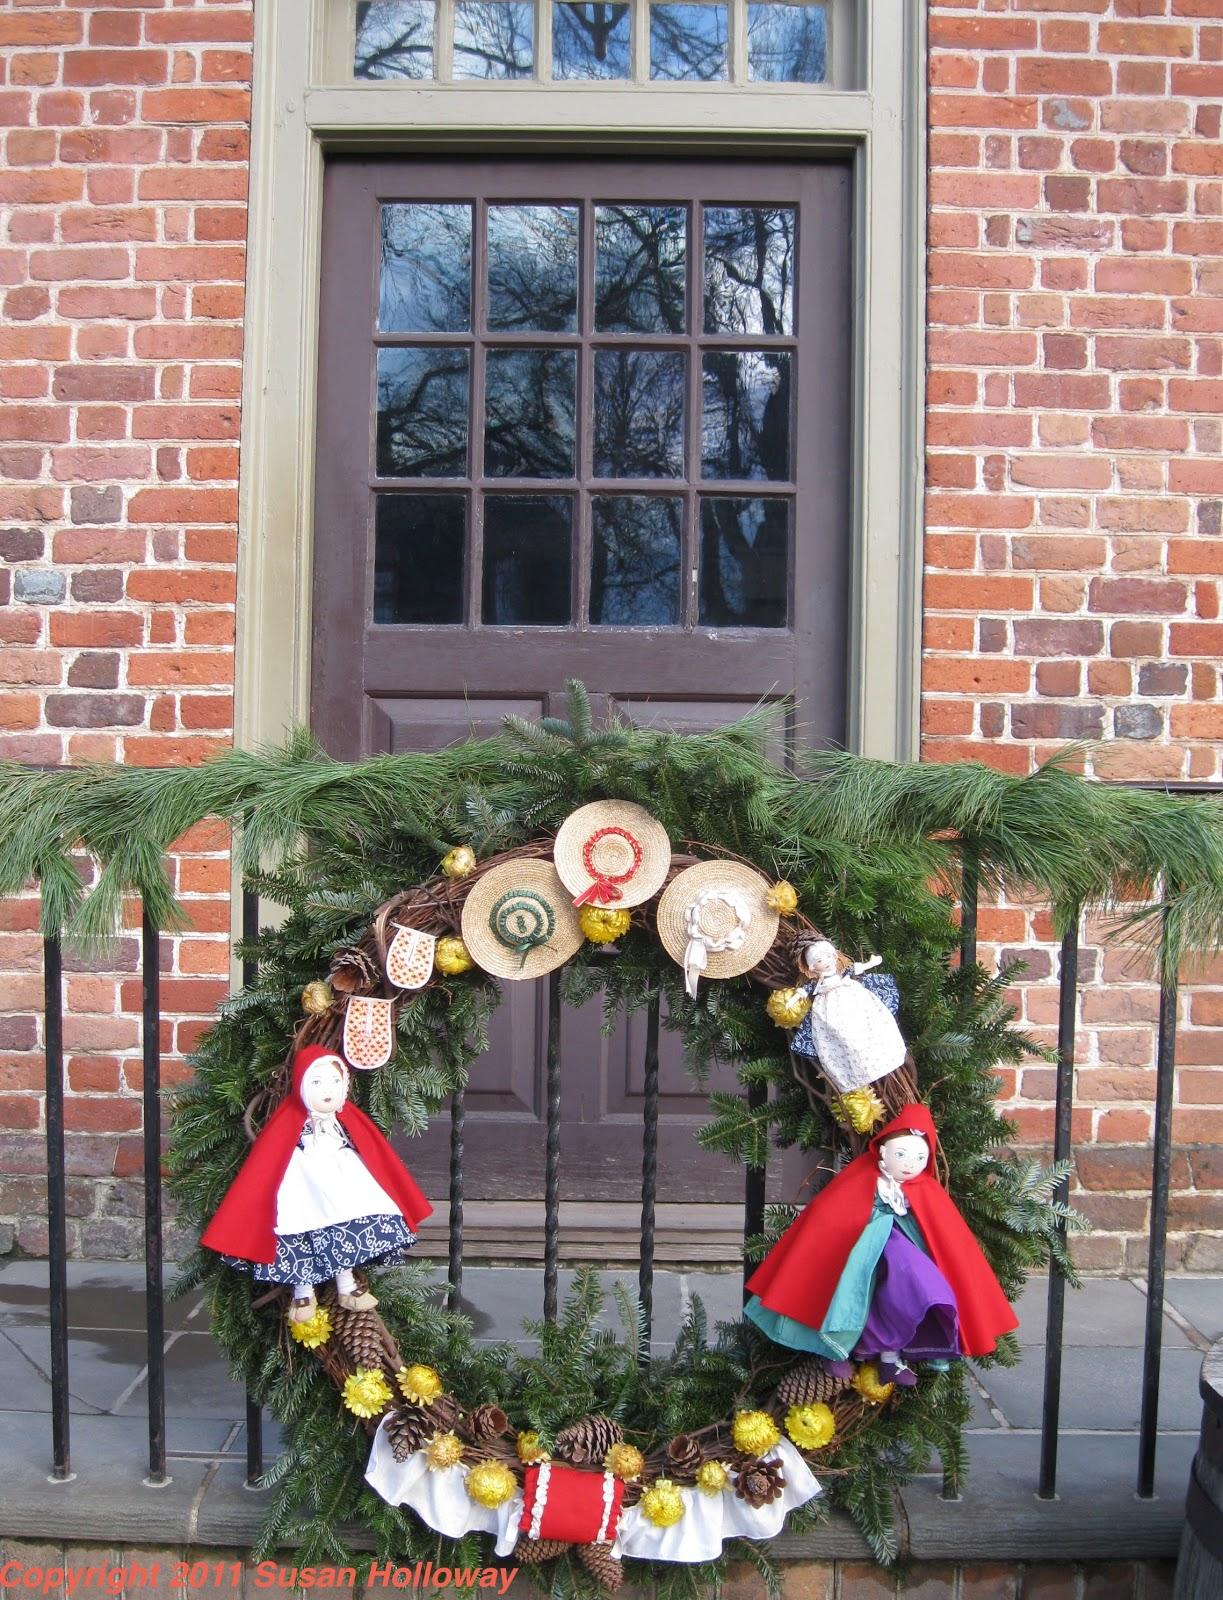 Colonial Williamsburg Christmas.Two Nerdy History Girls Christmas In Colonial Williamsburg